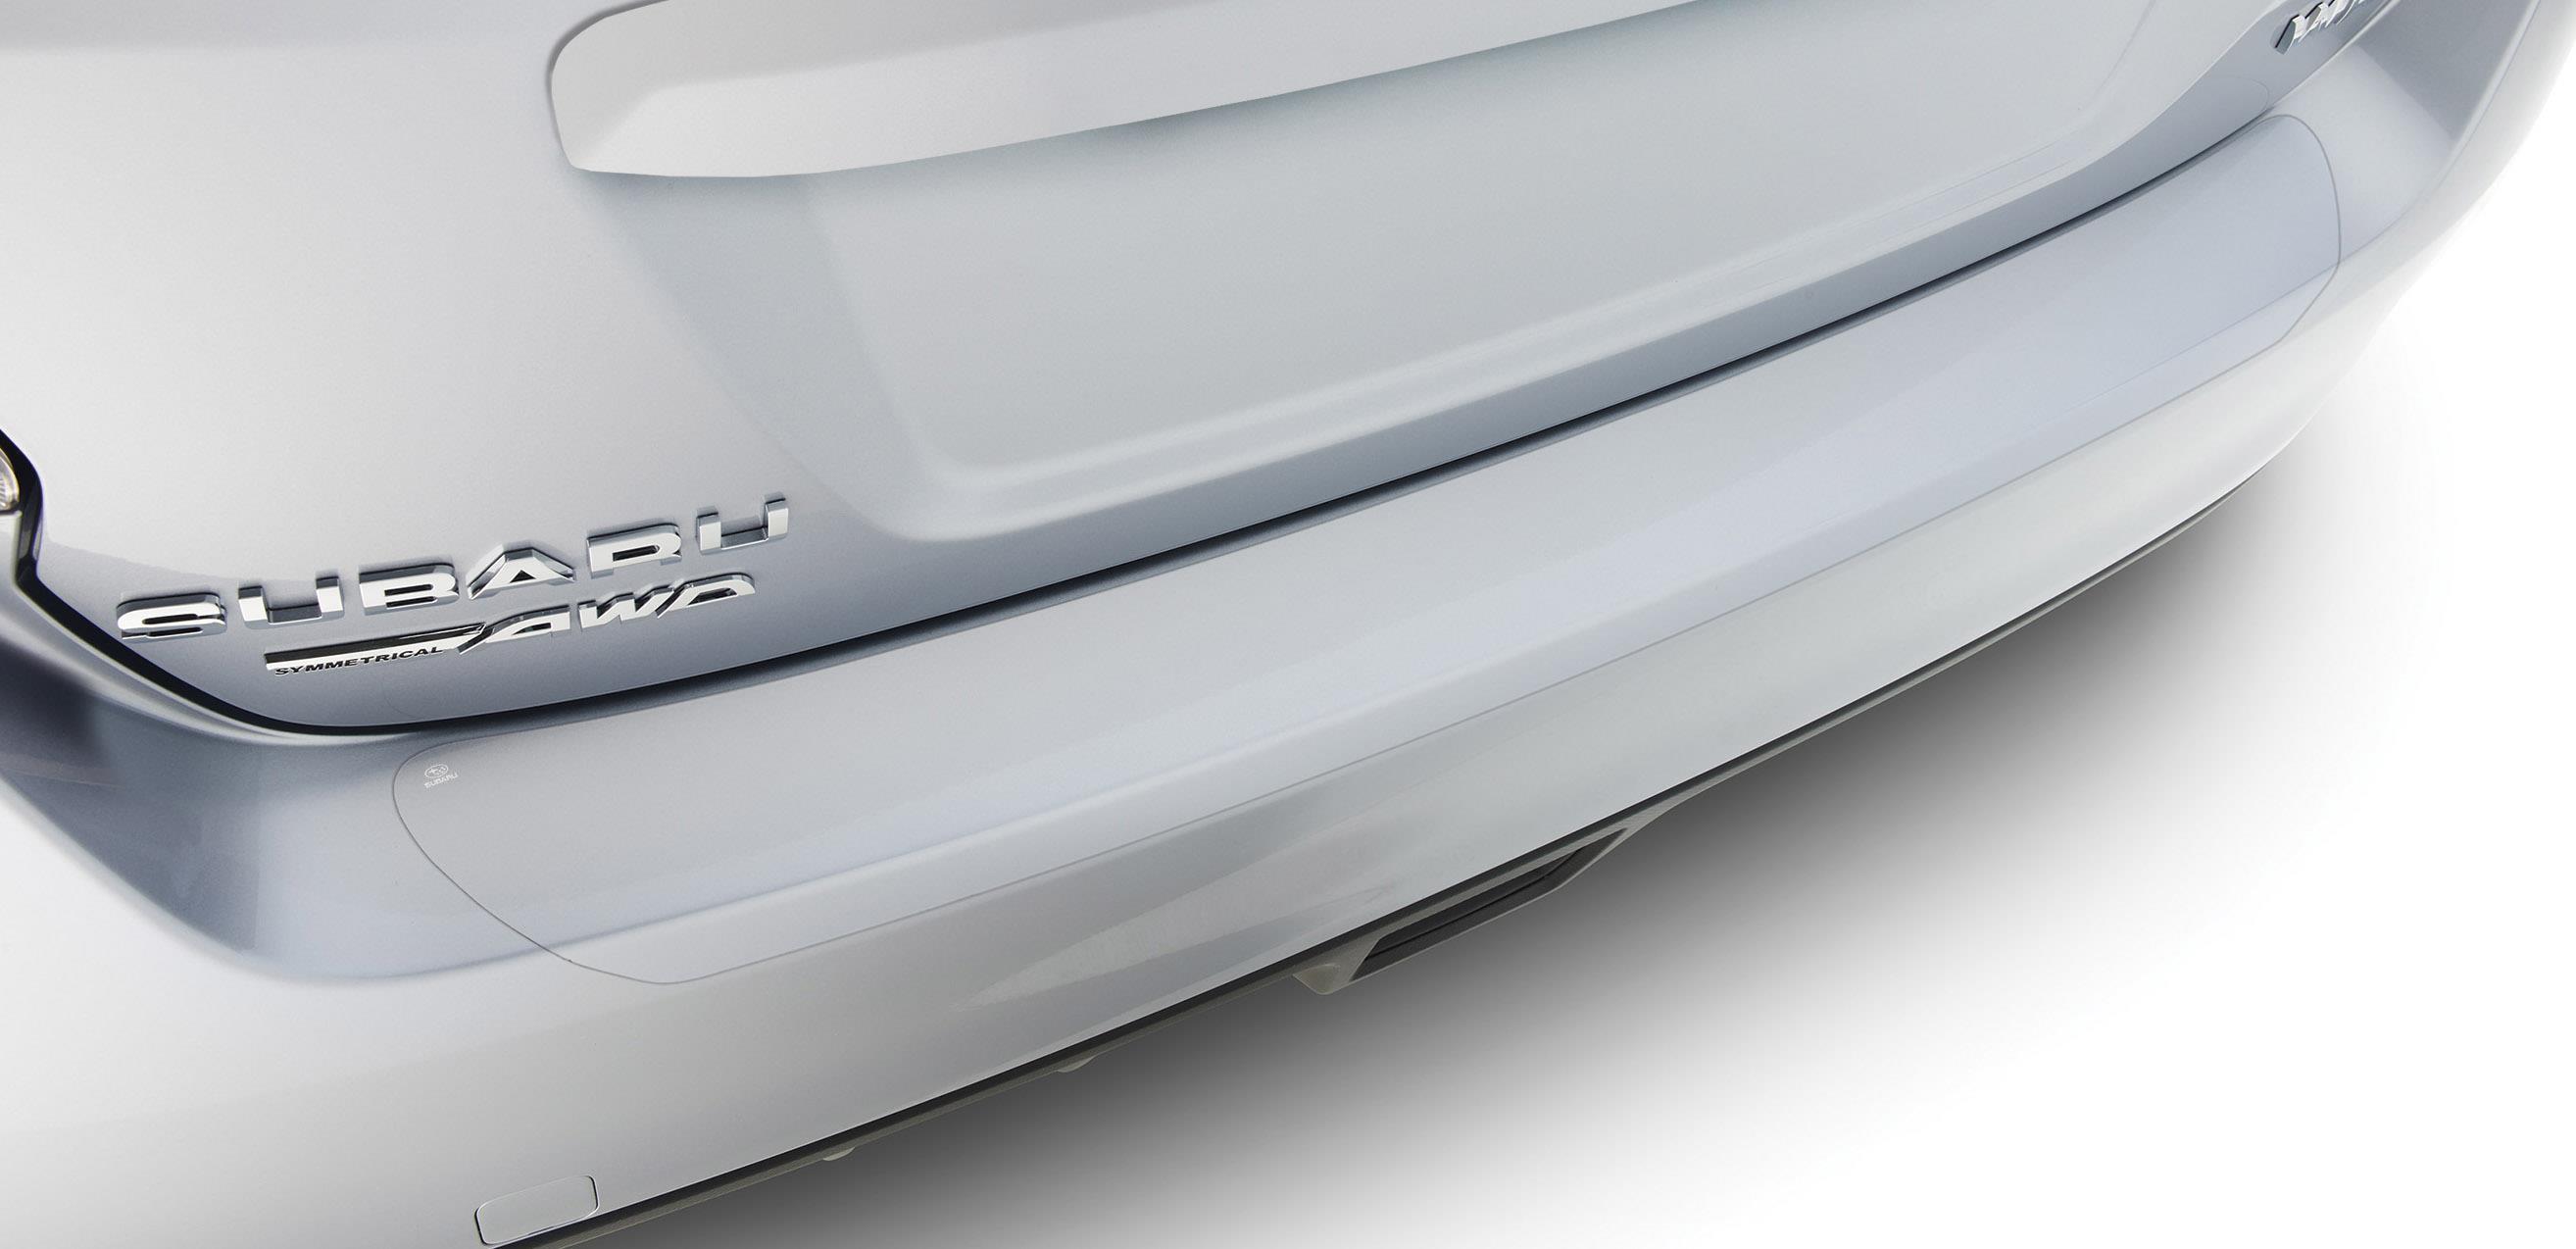 Subaru Sti Rear Bumper Applique 4dr Rear Bumper Appl